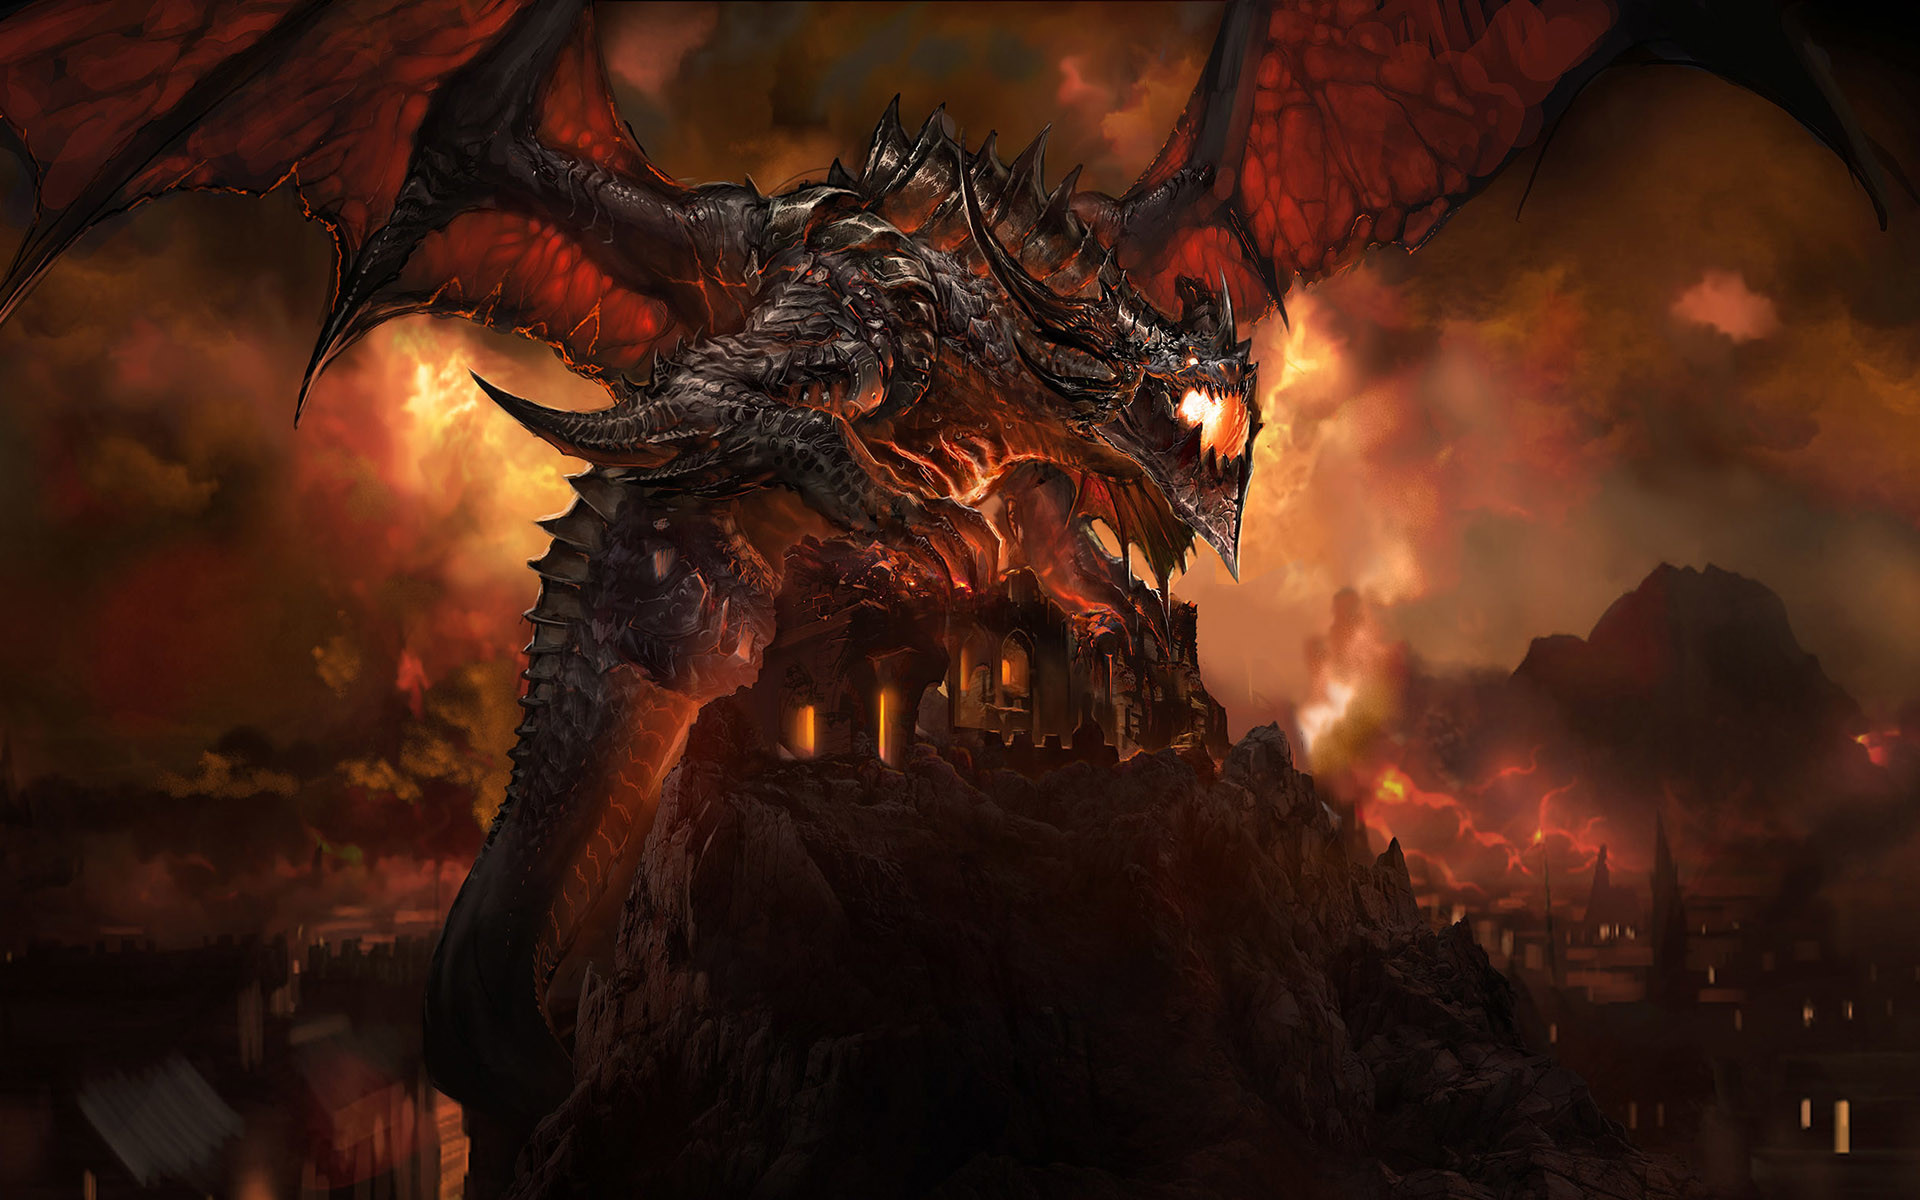 Epic Dragon Wallpaper (73+ images)